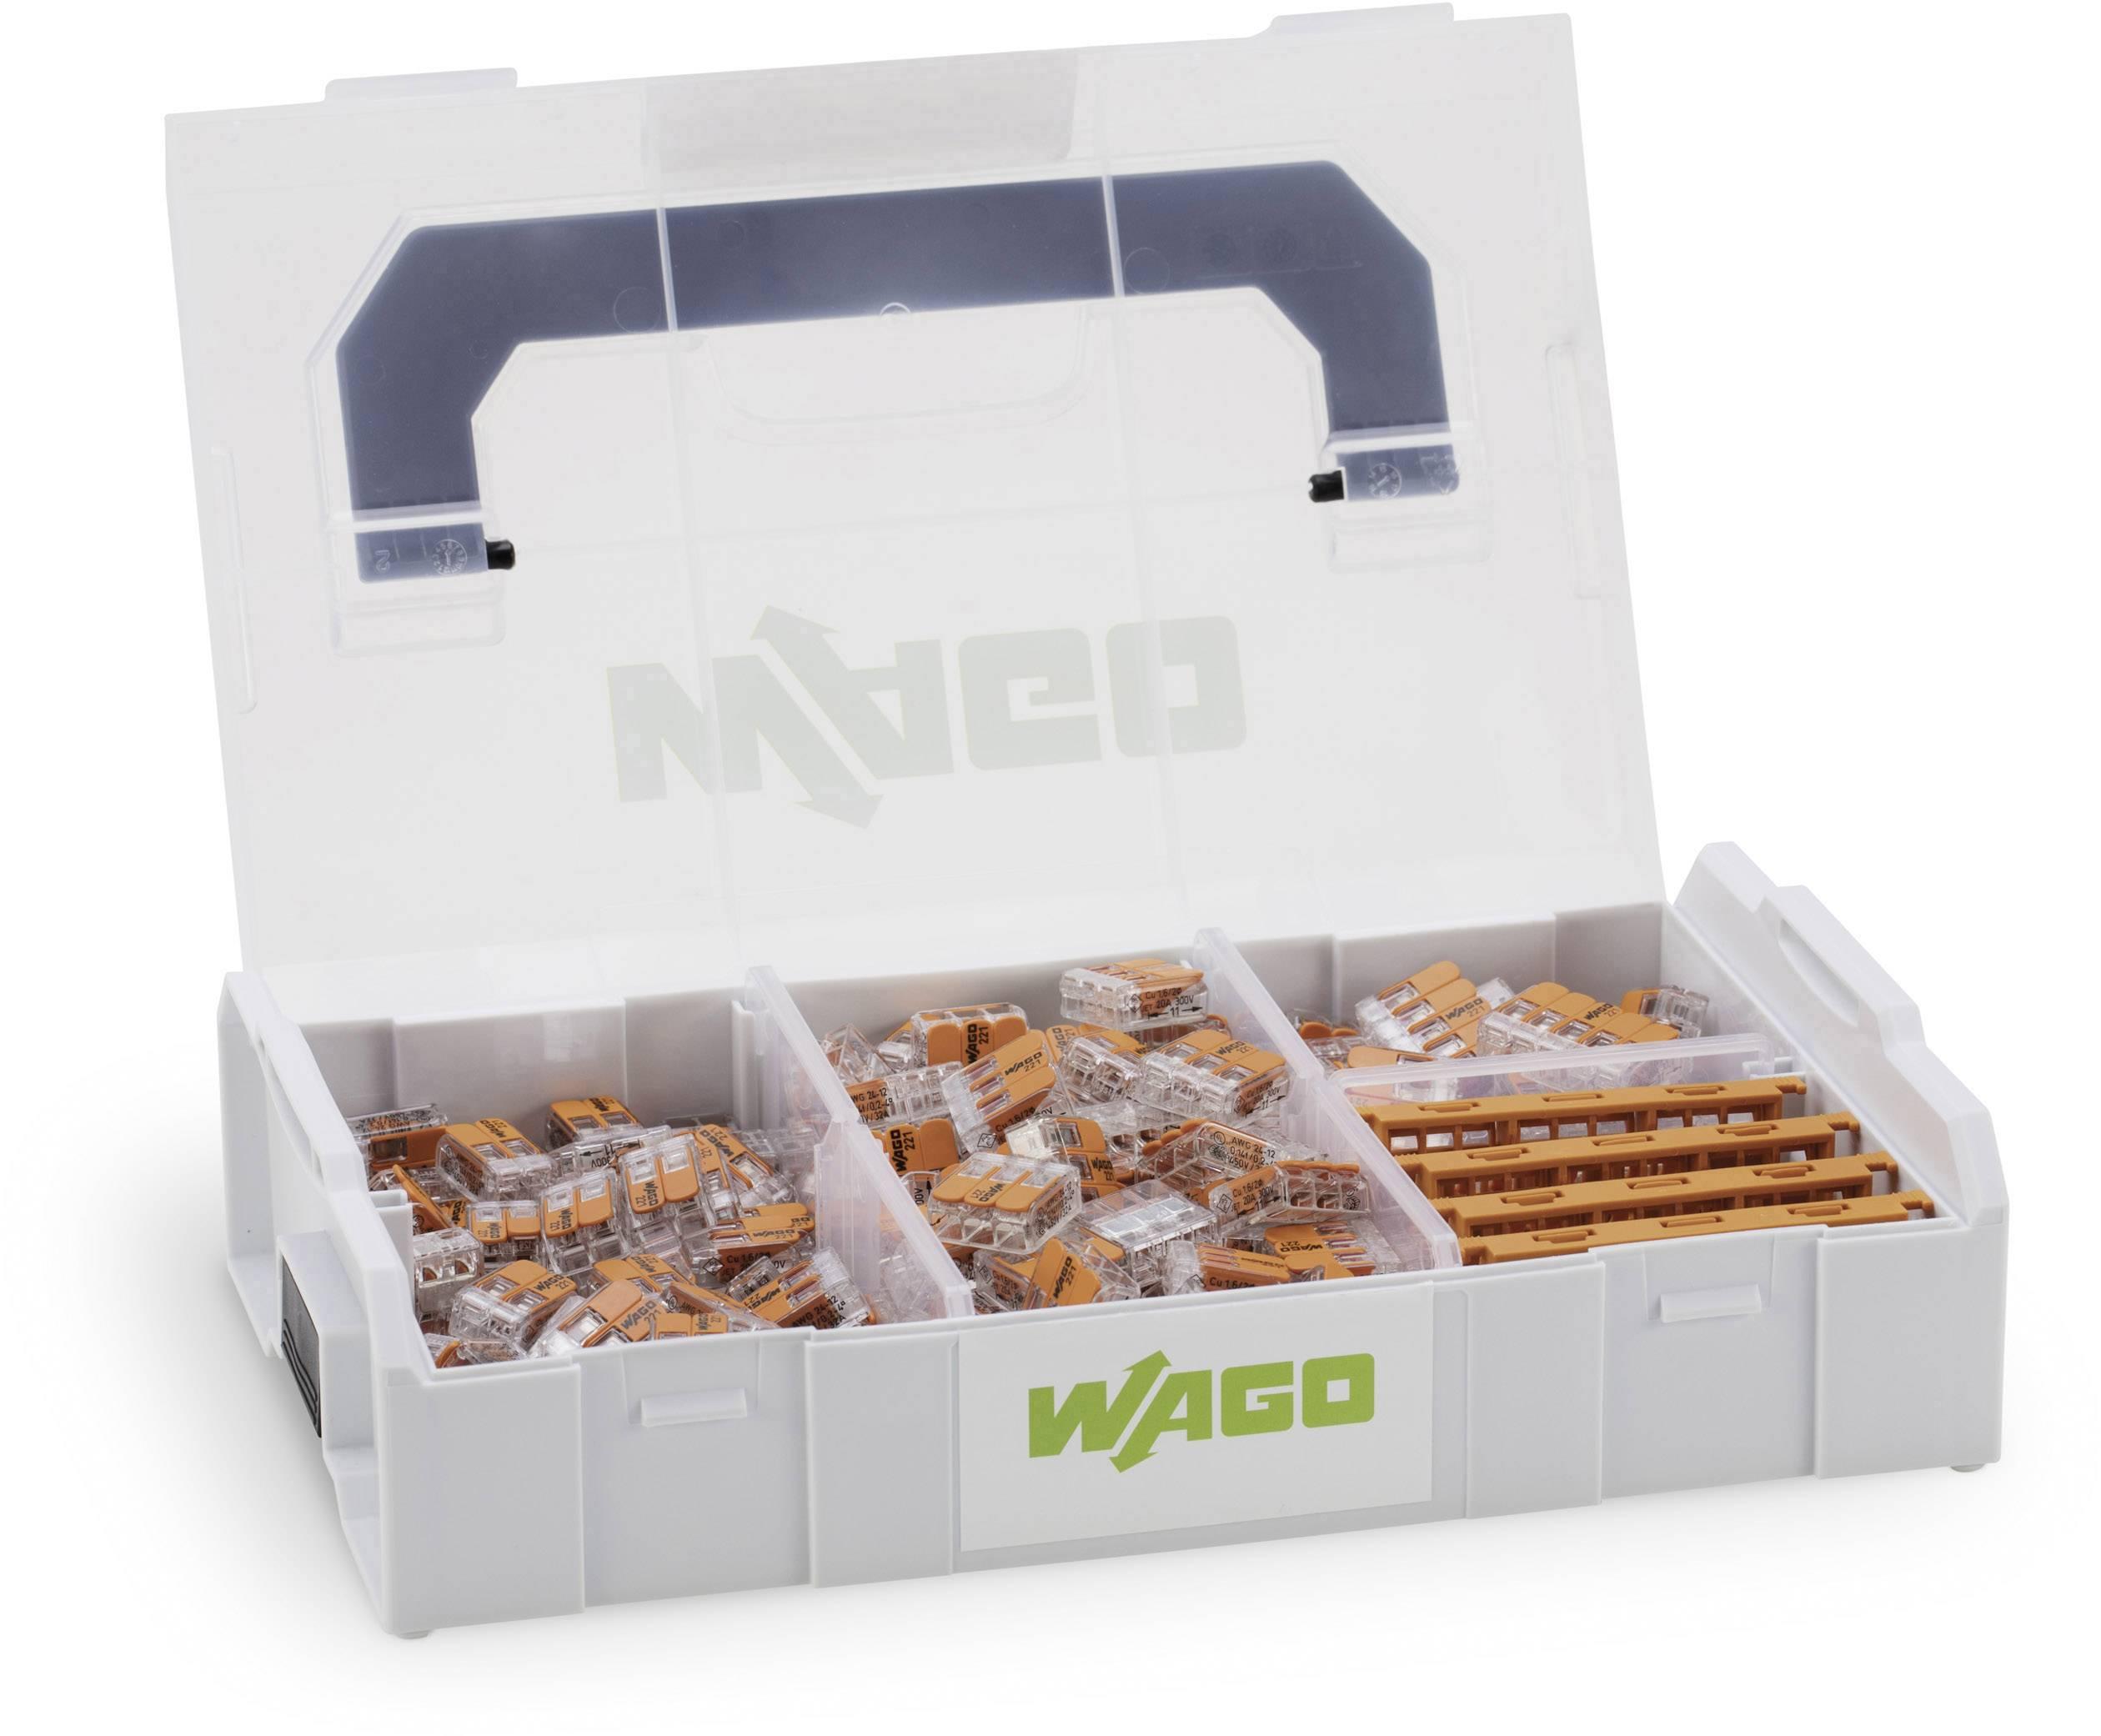 WAGO WA-741-644 Verbindungsklemmen-Sortiment flexibel 0.14-4 mm² starr 0.2-4 m